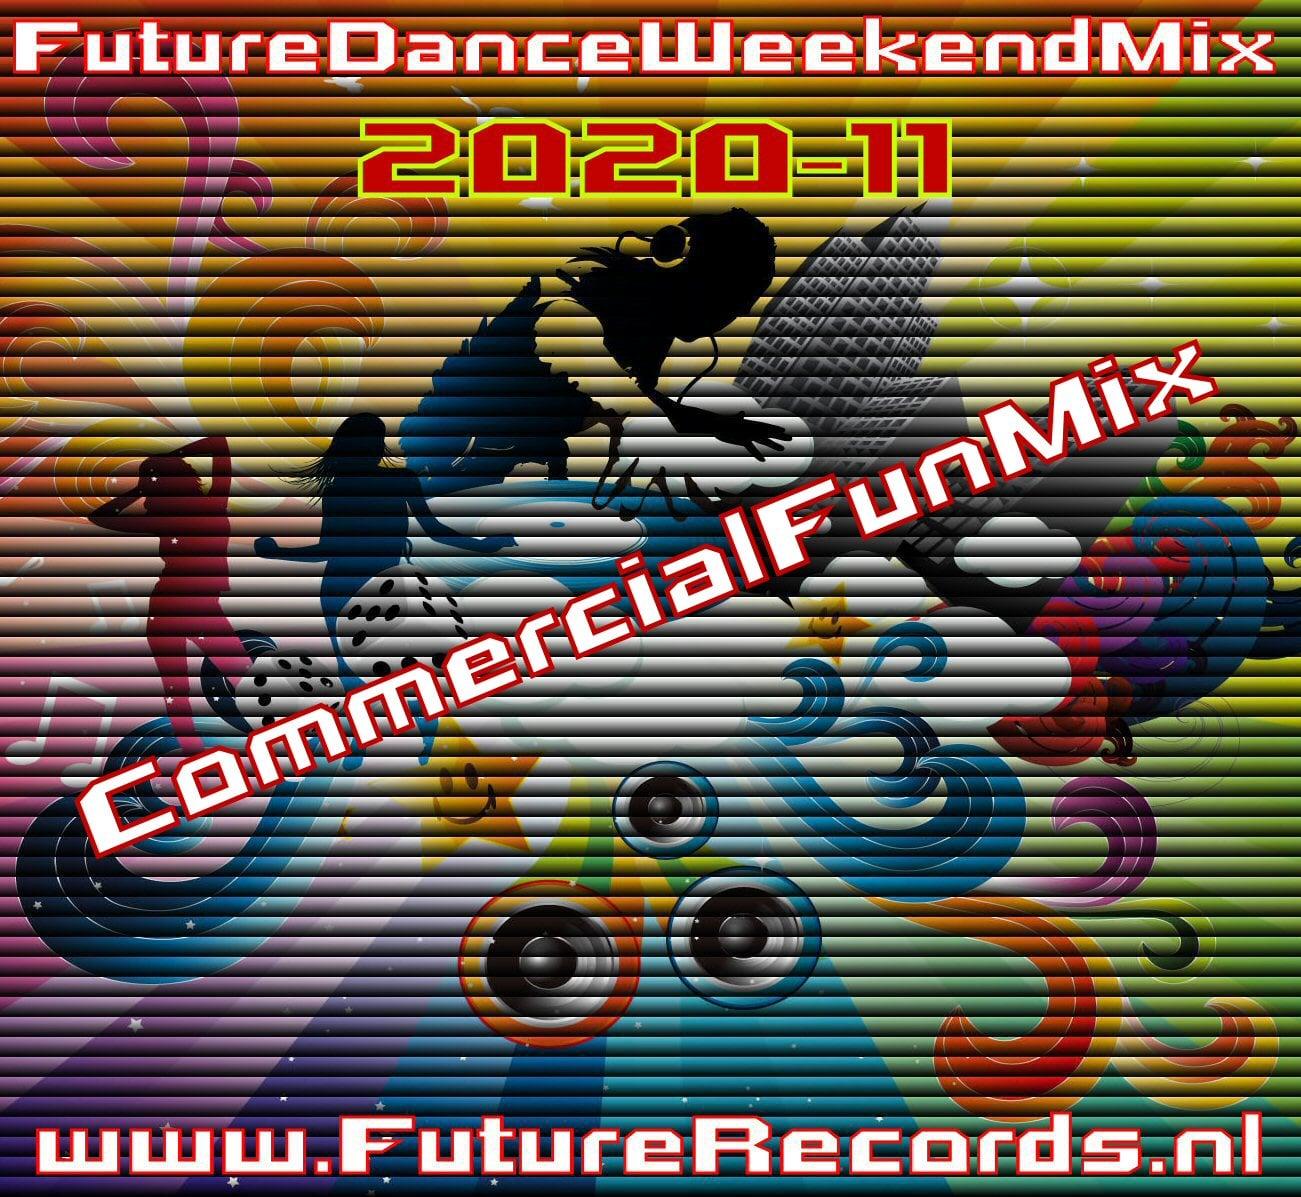 Future Dance Weekend Mix 2020-11